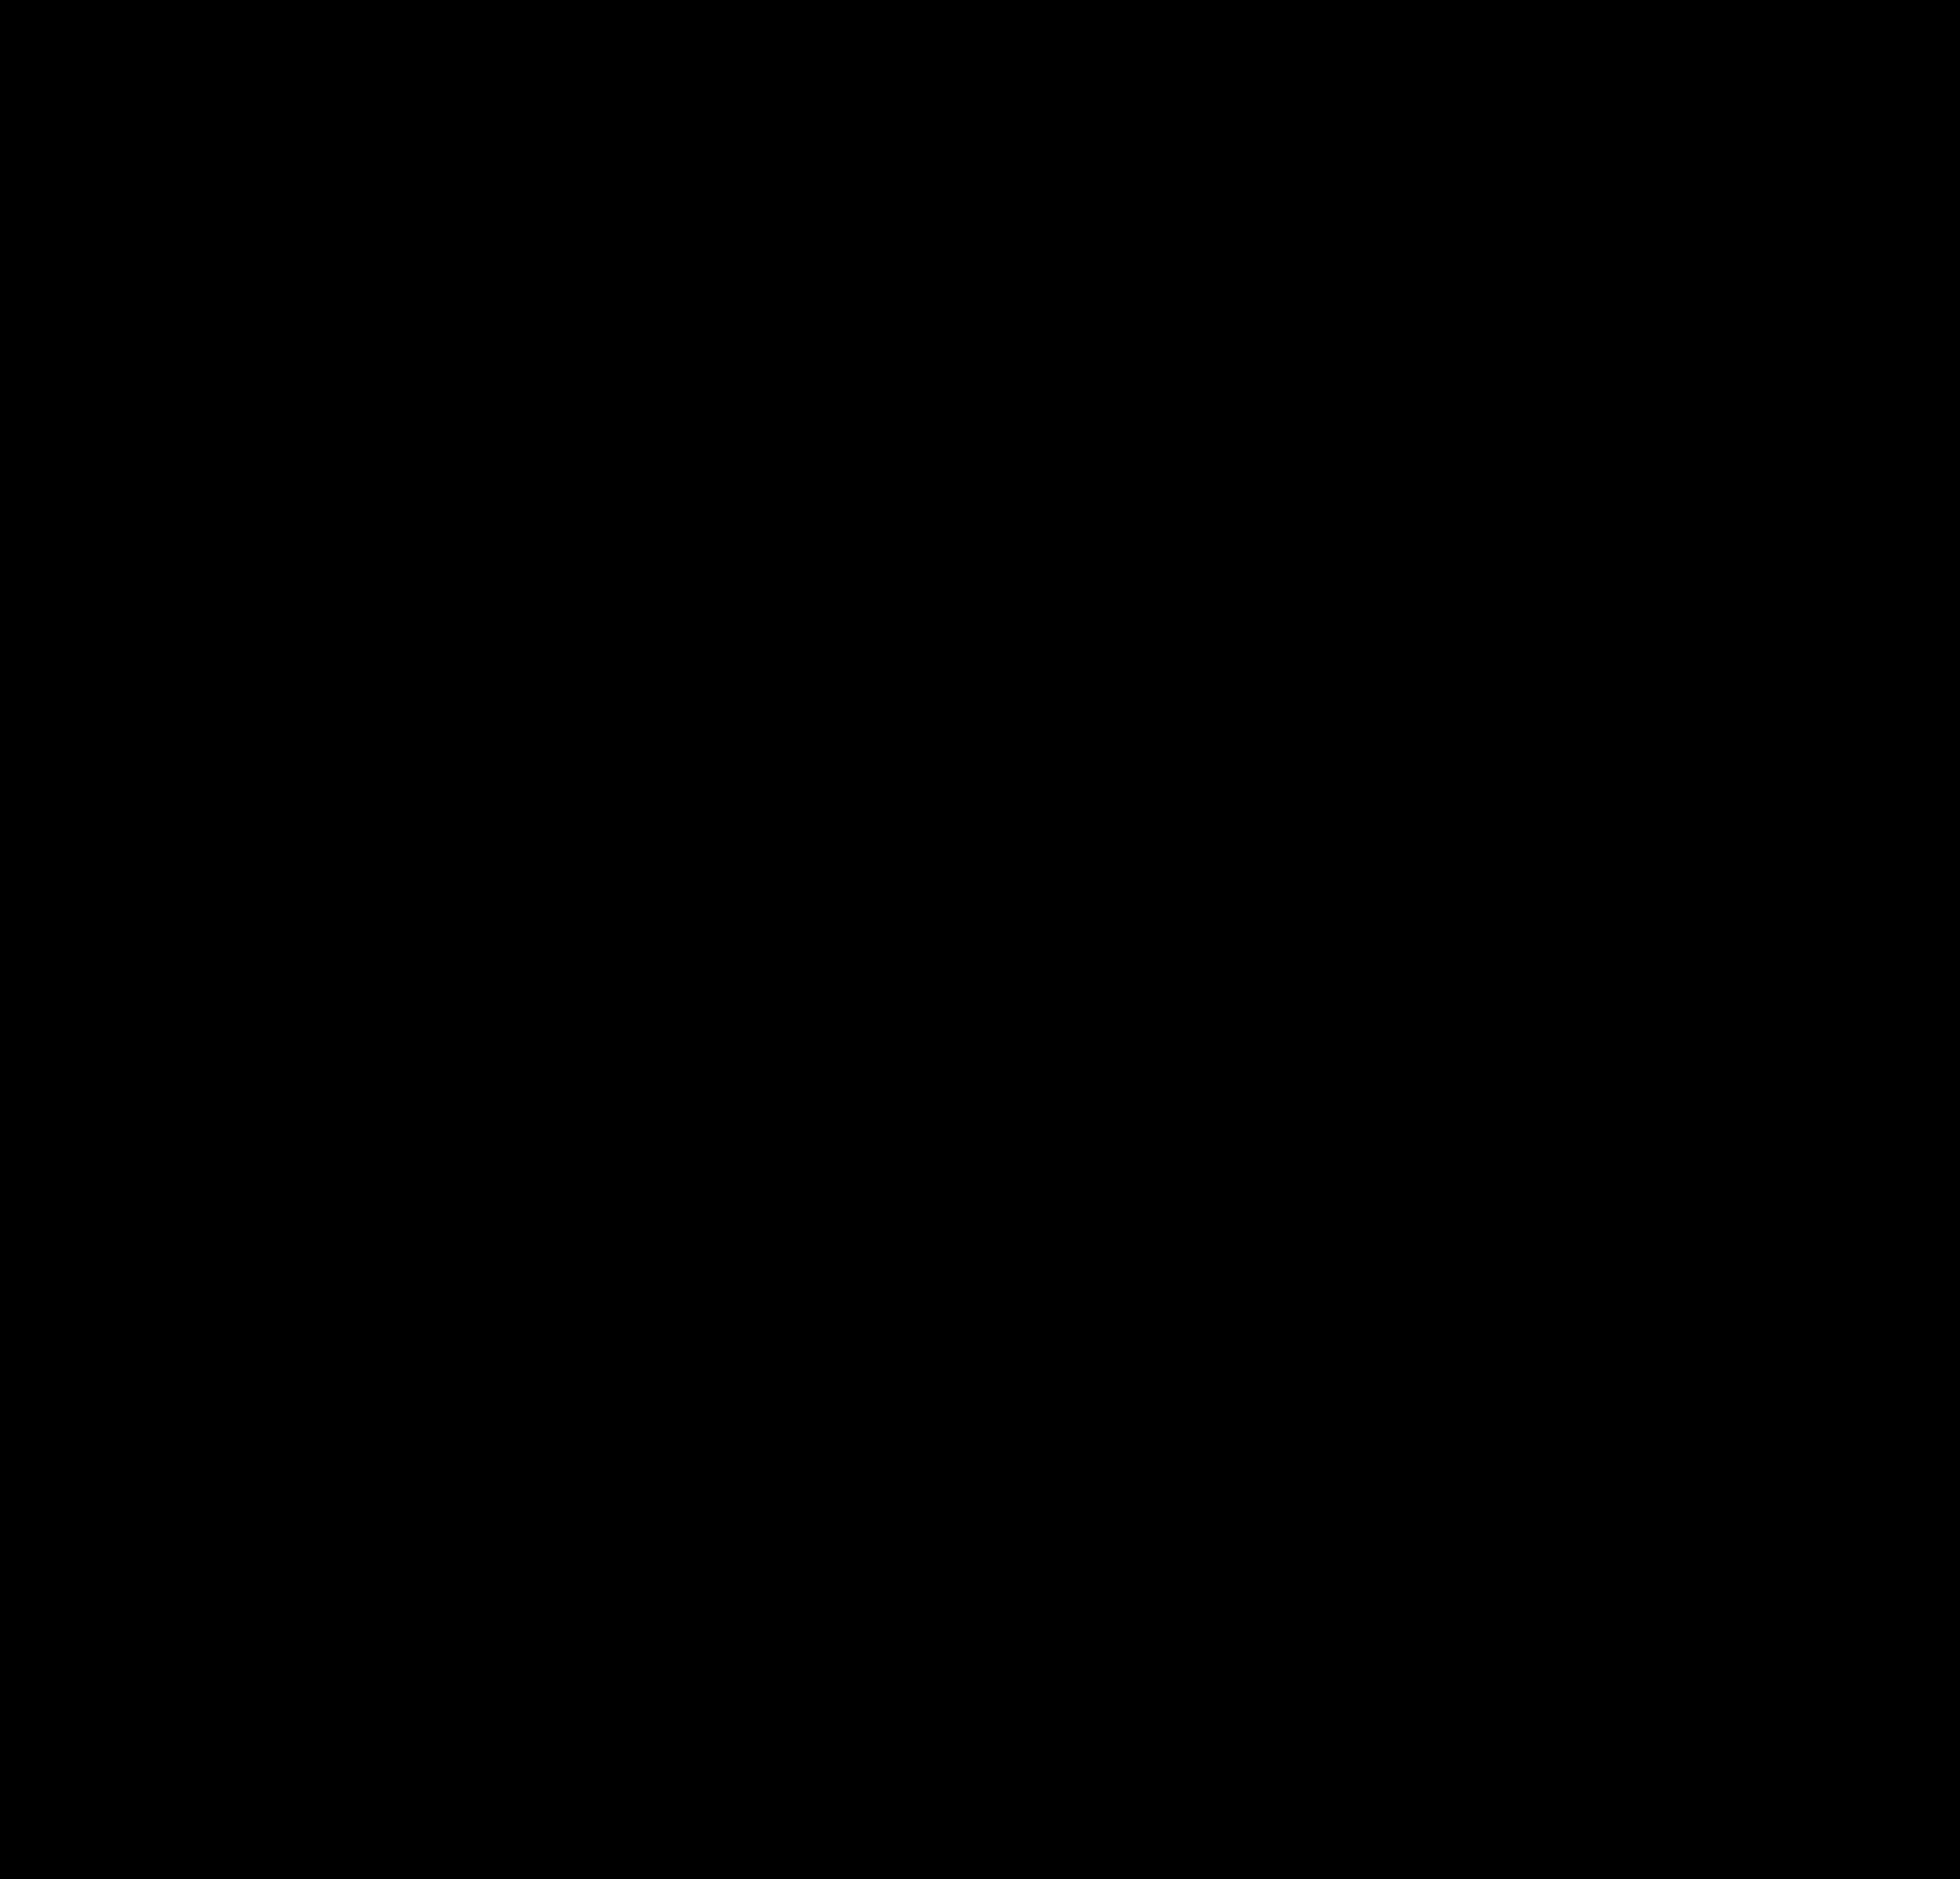 6 Motocross Silhouette (PNG Transparent) | OnlyGFX.com